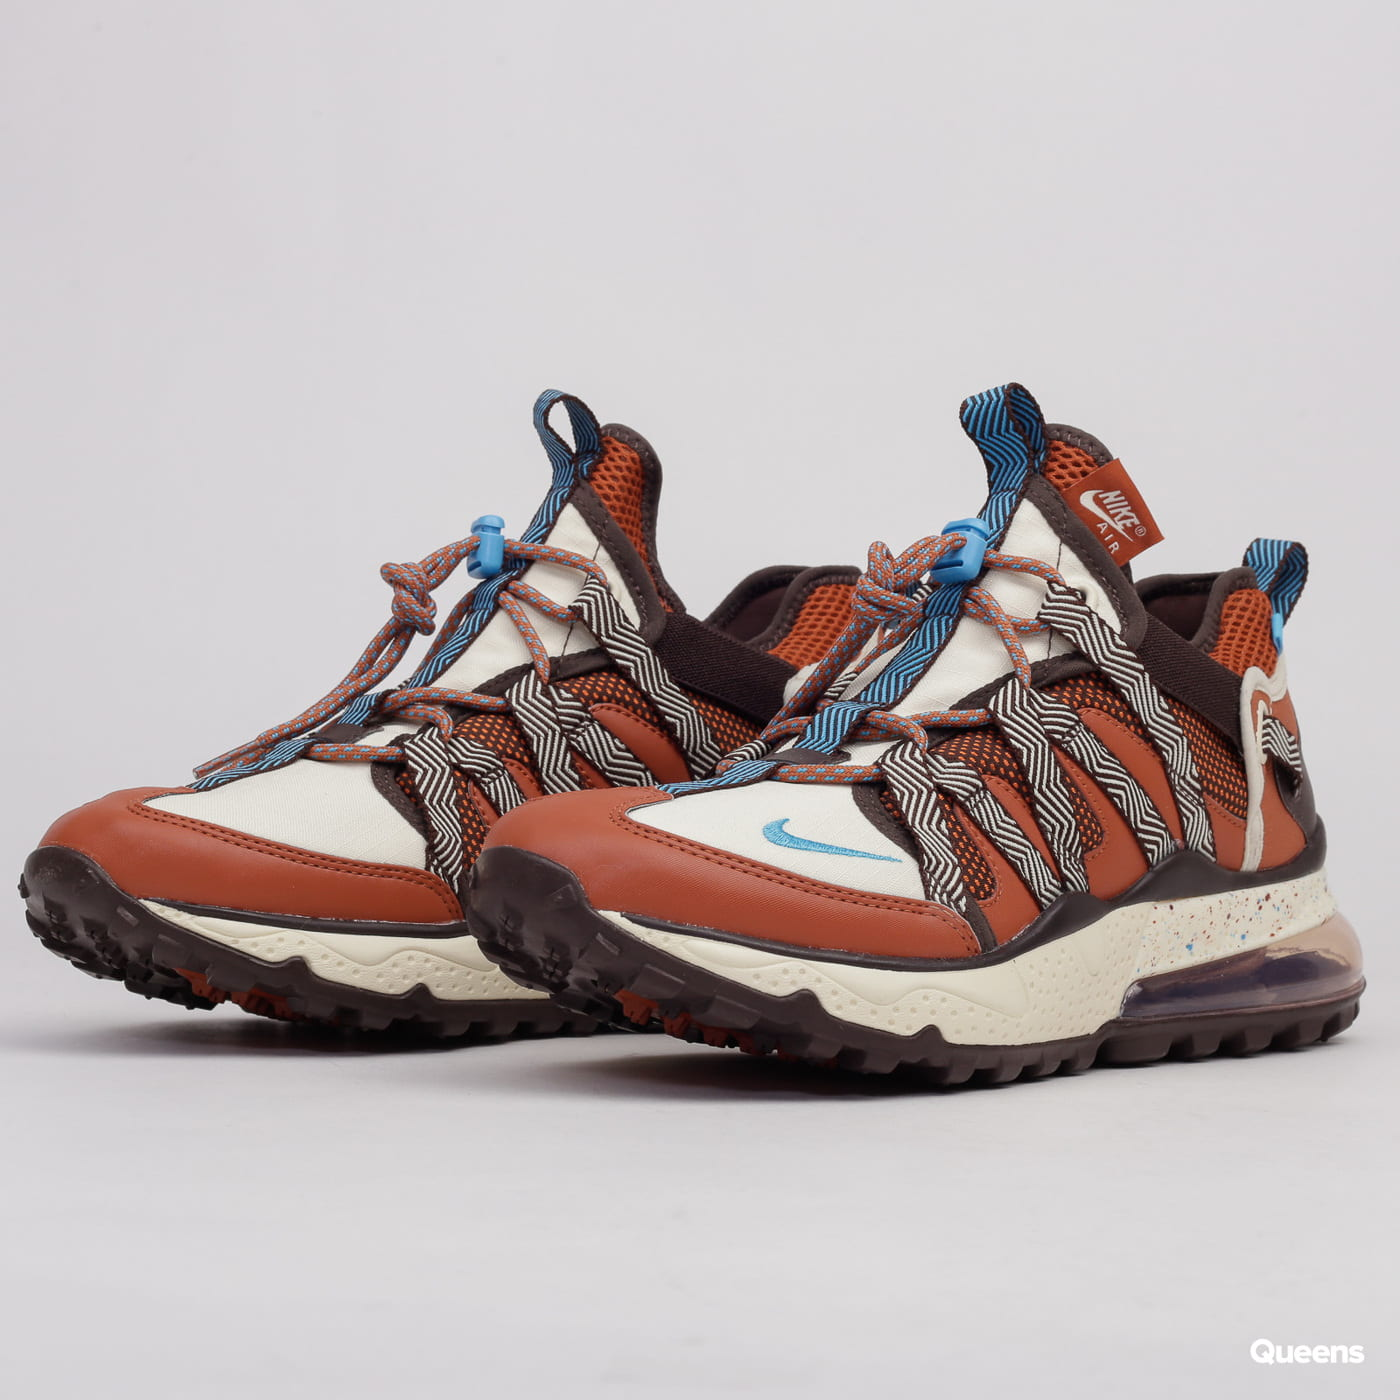 Sneakers Nike Air Max 270 Bowfin dark